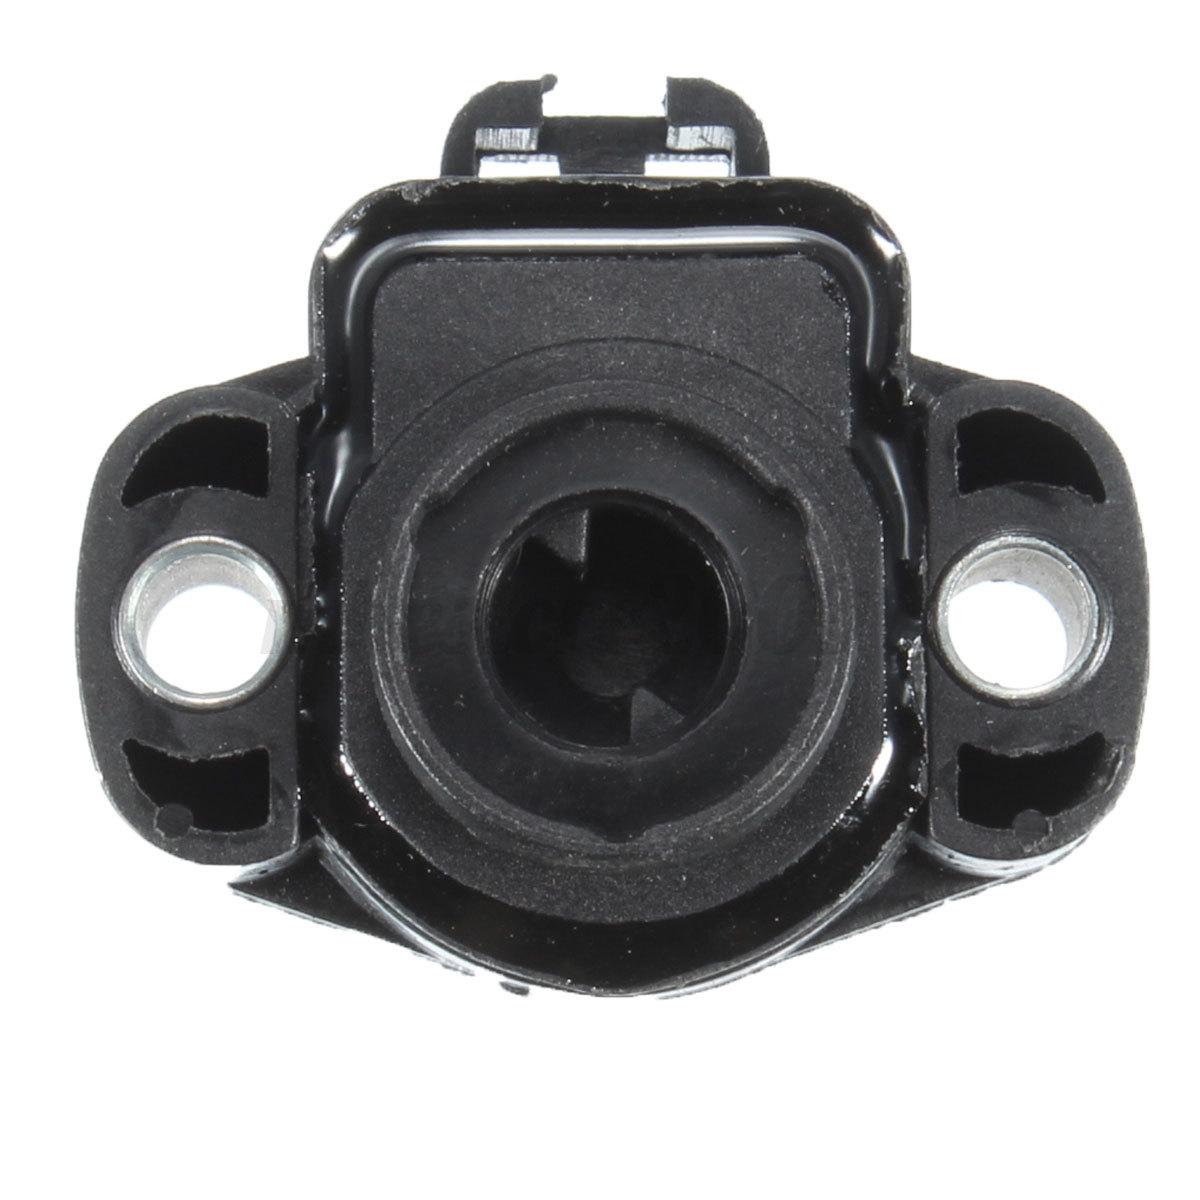 Throttle Position Sensor Jeep Yj: TH189 Throttle Position Sensor For Jeep Cherokee Dodge